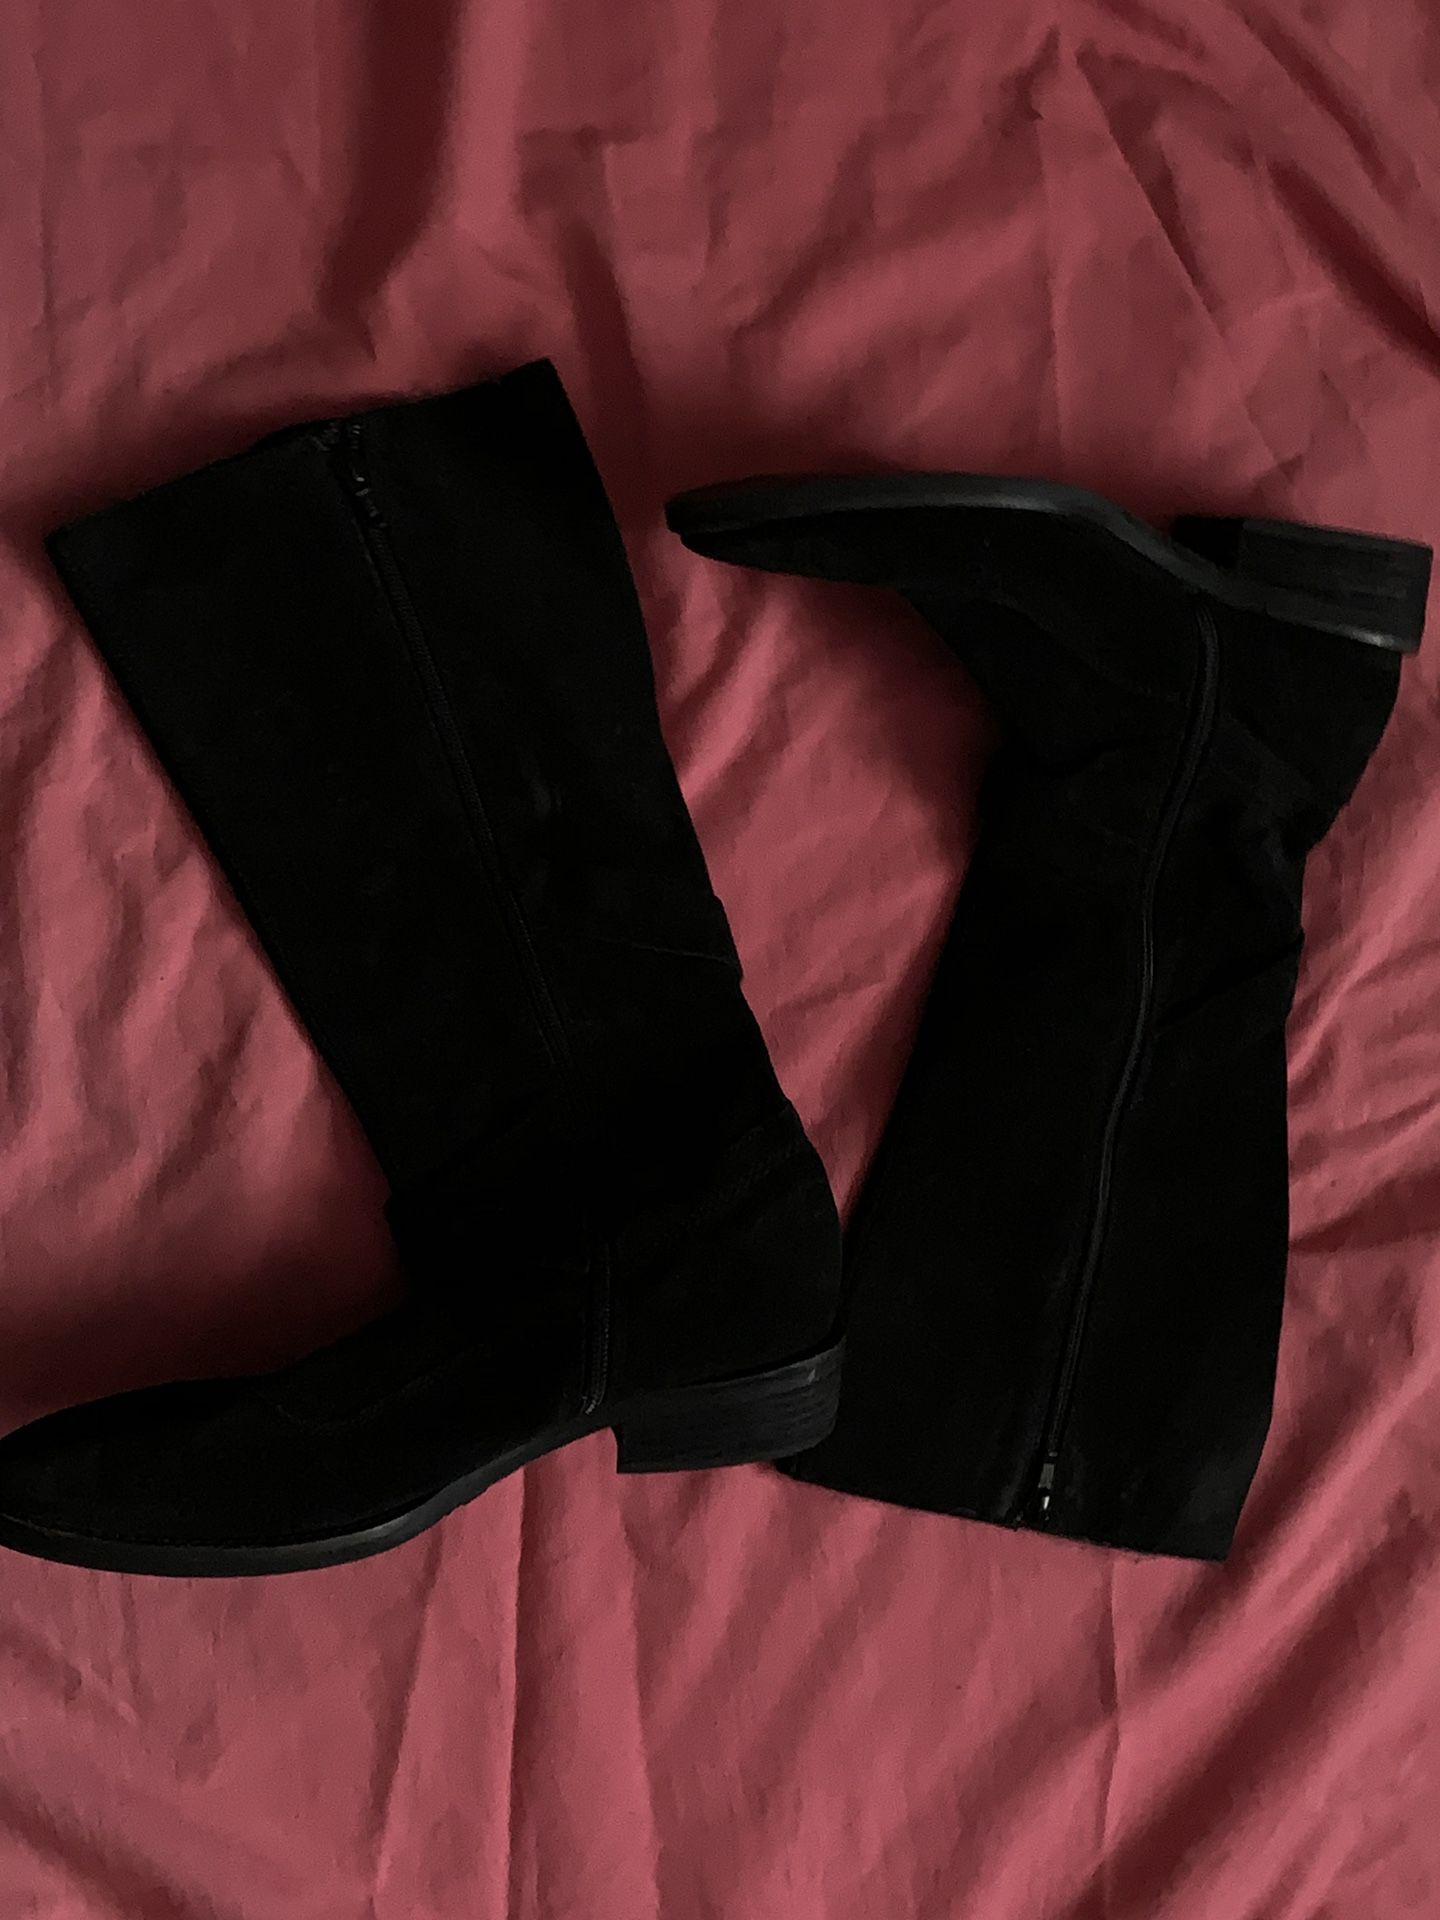 Boots CORDANI size 10 R price $362